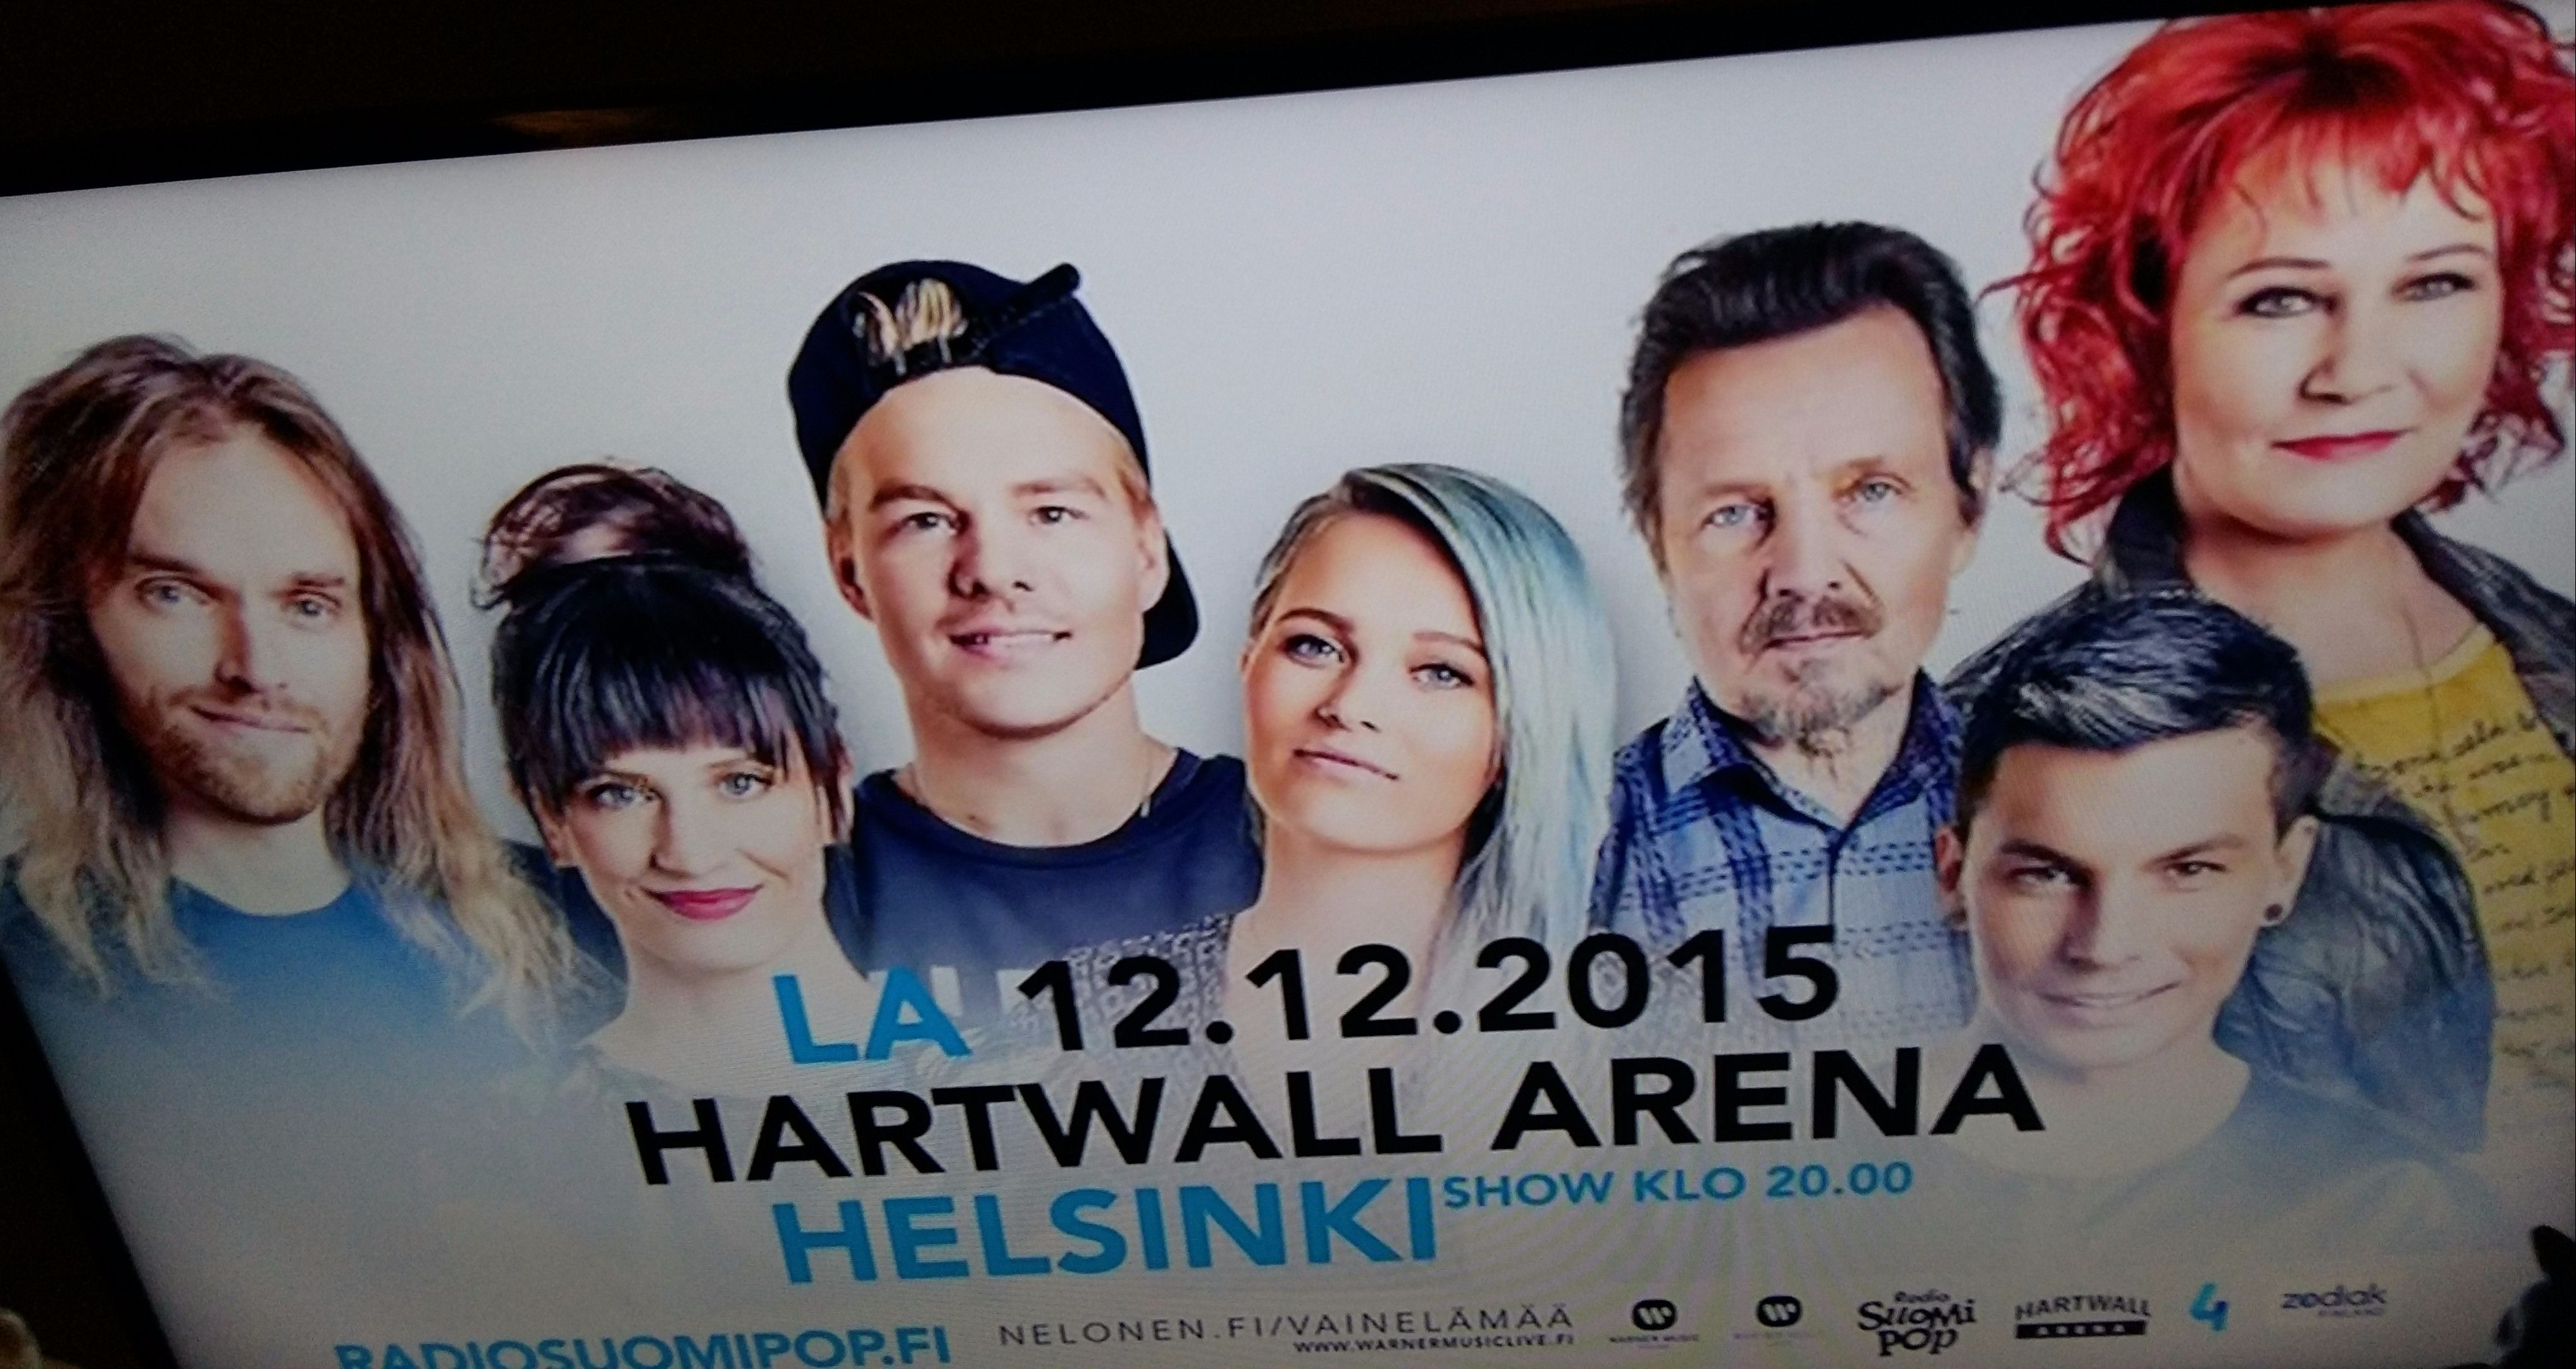 Musikaalit Helsinki